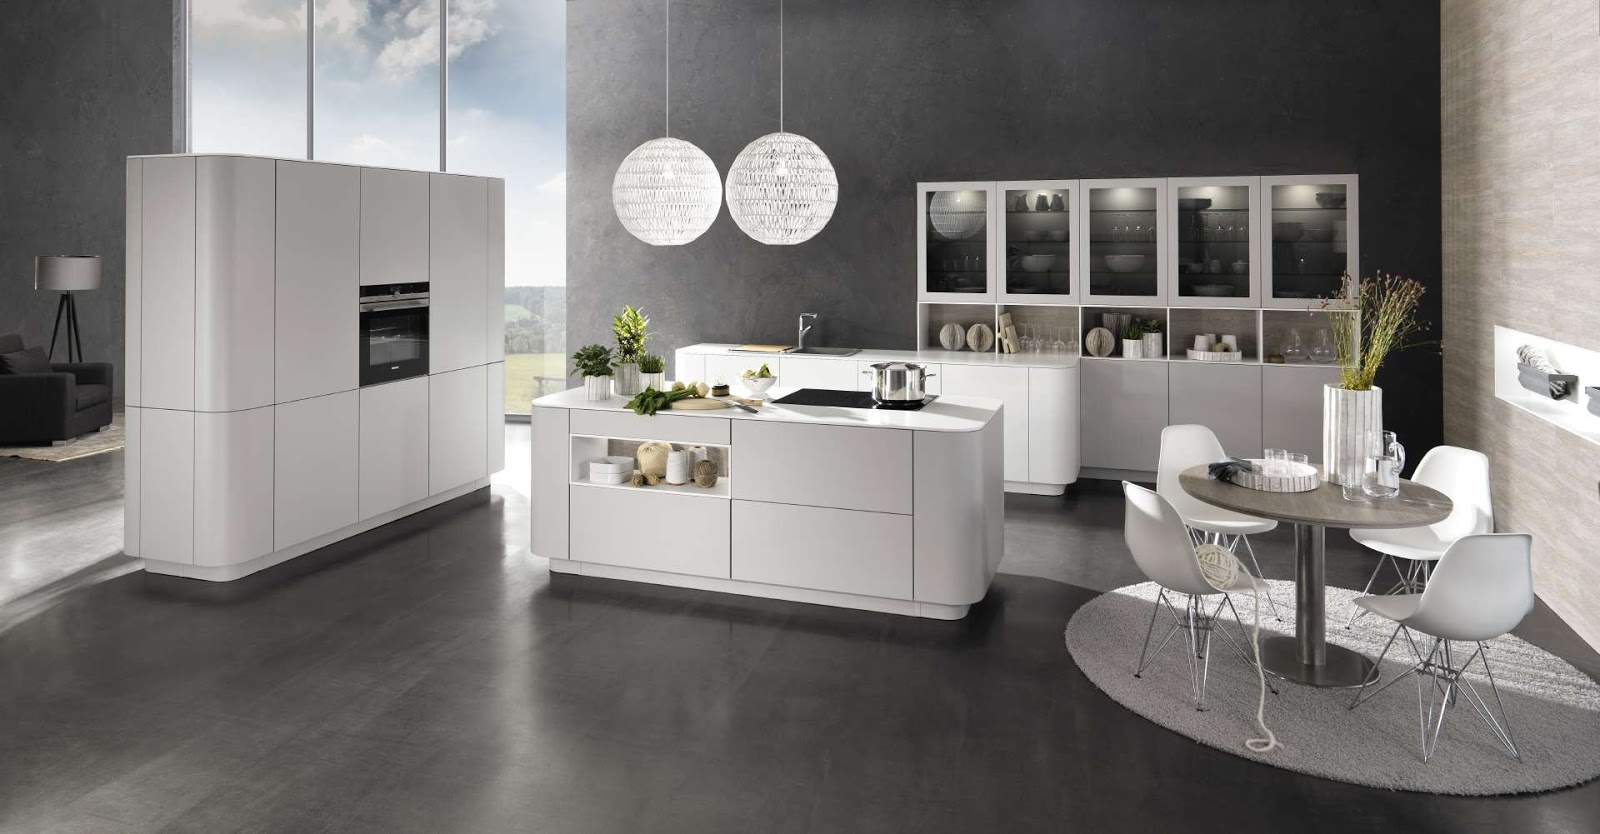 Küche Aktuell Buchholz küchen aktuell buchholz verkaufsoffener sonntag home creation